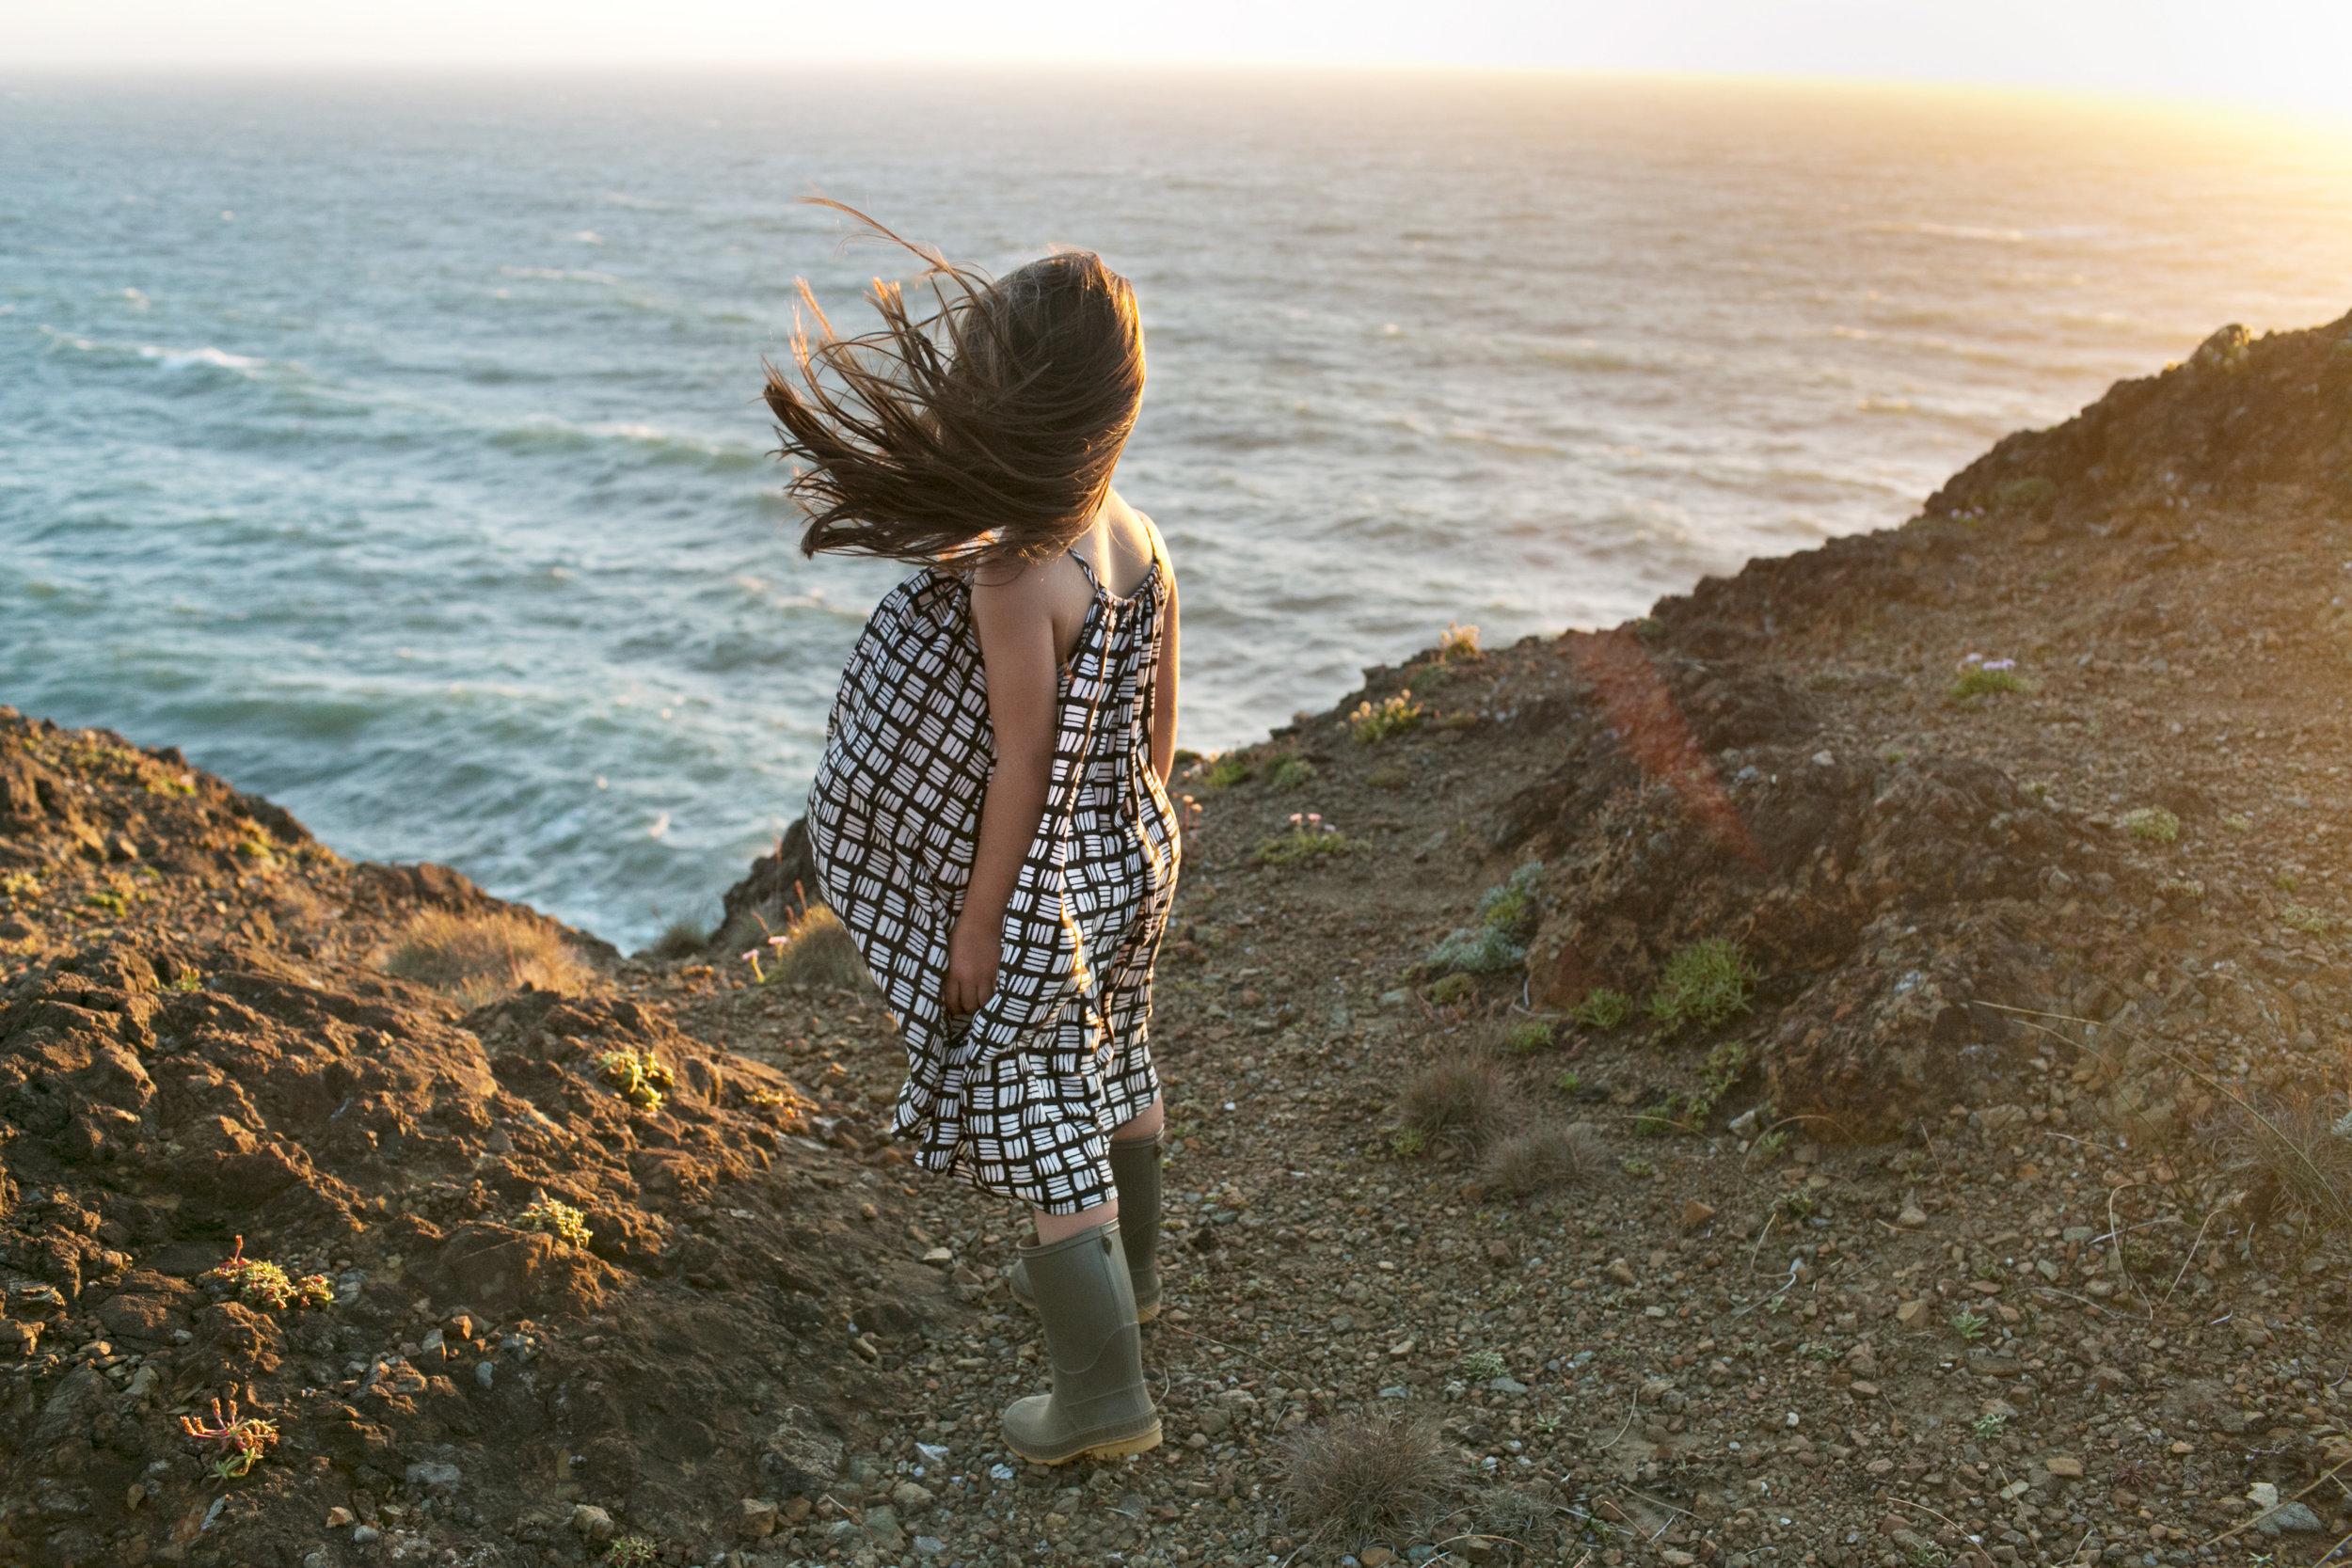 099Travel_Adventure_Outdoor_Photography_Outlive_Creative_Oregon_Coast_Samuel H Boardman State Park.jpg